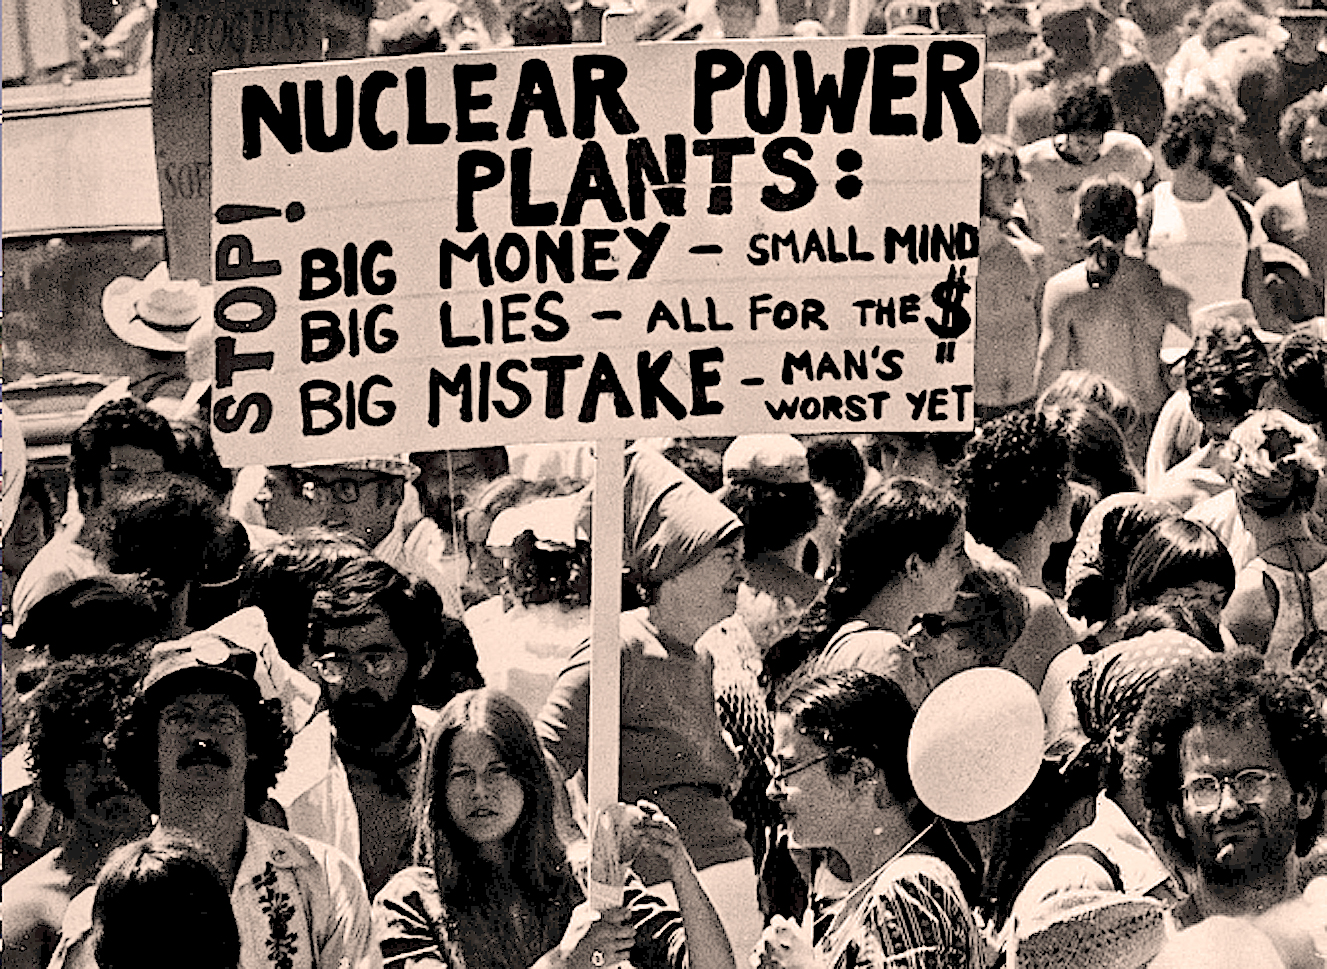 Demonstration at Seabrook - 1978